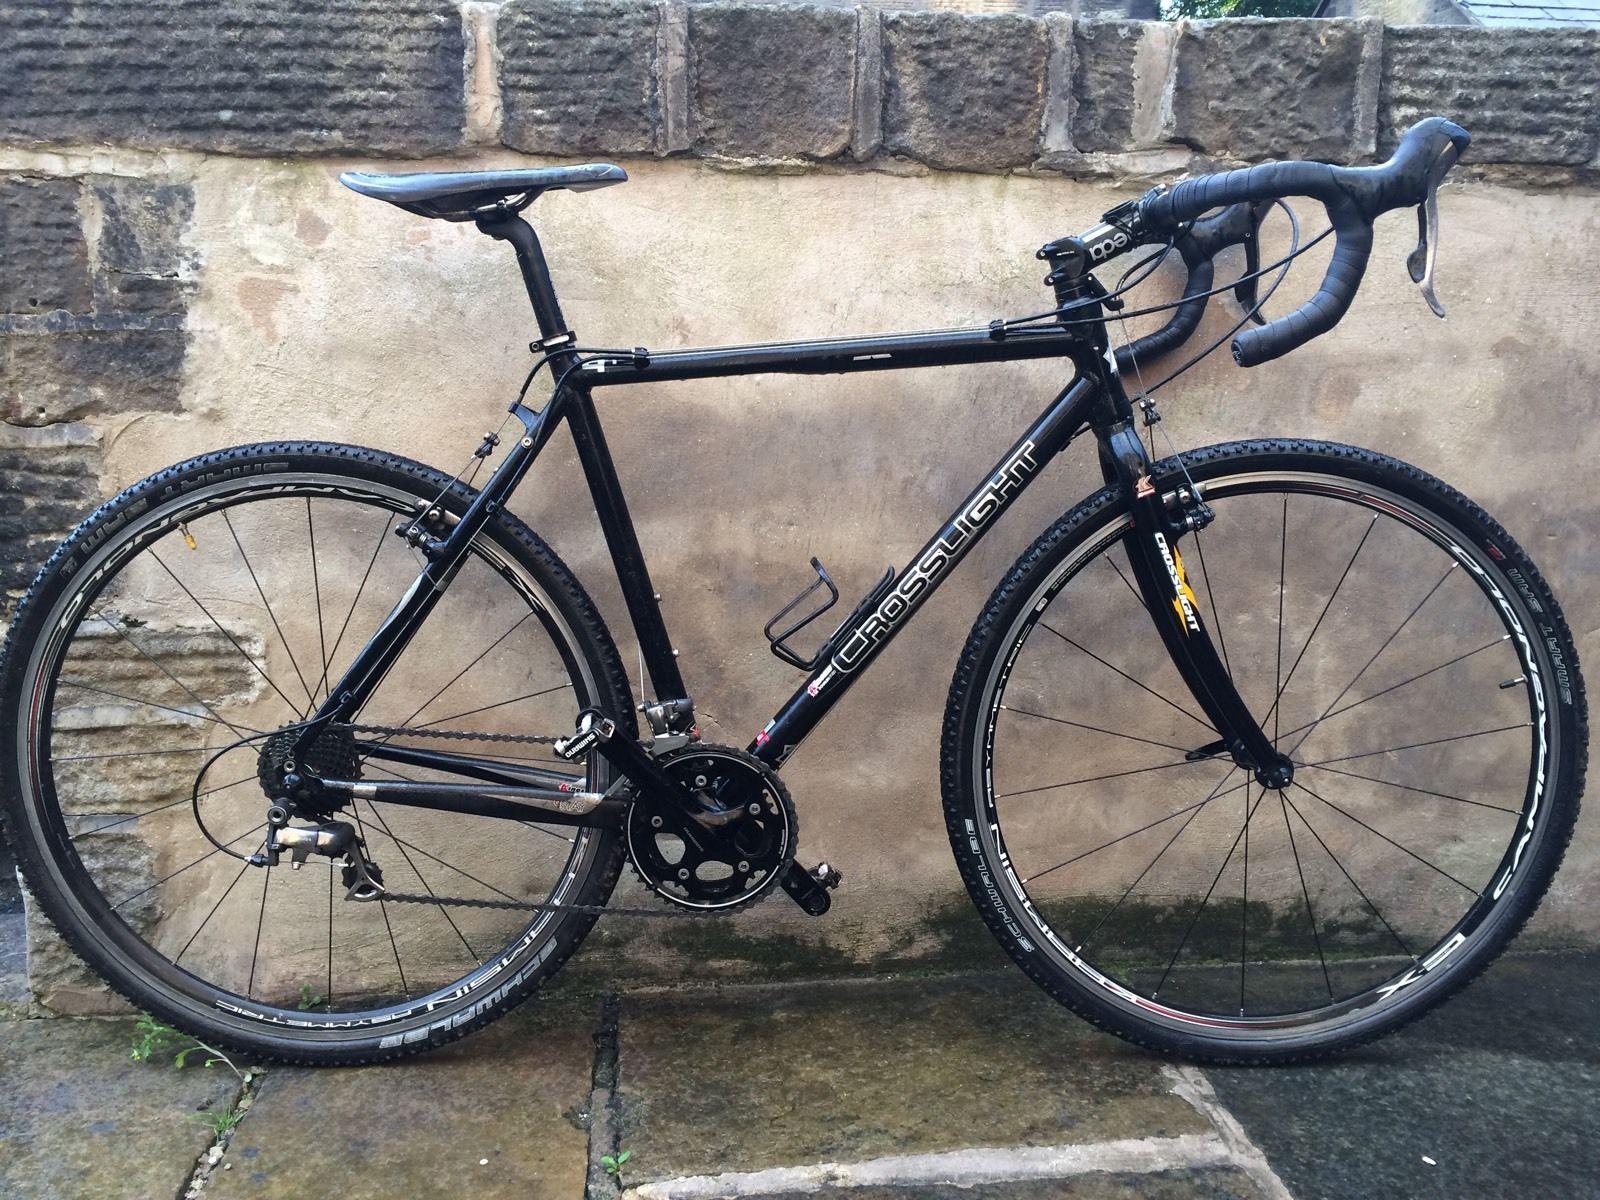 Stolen Bristol Bikes September 2015